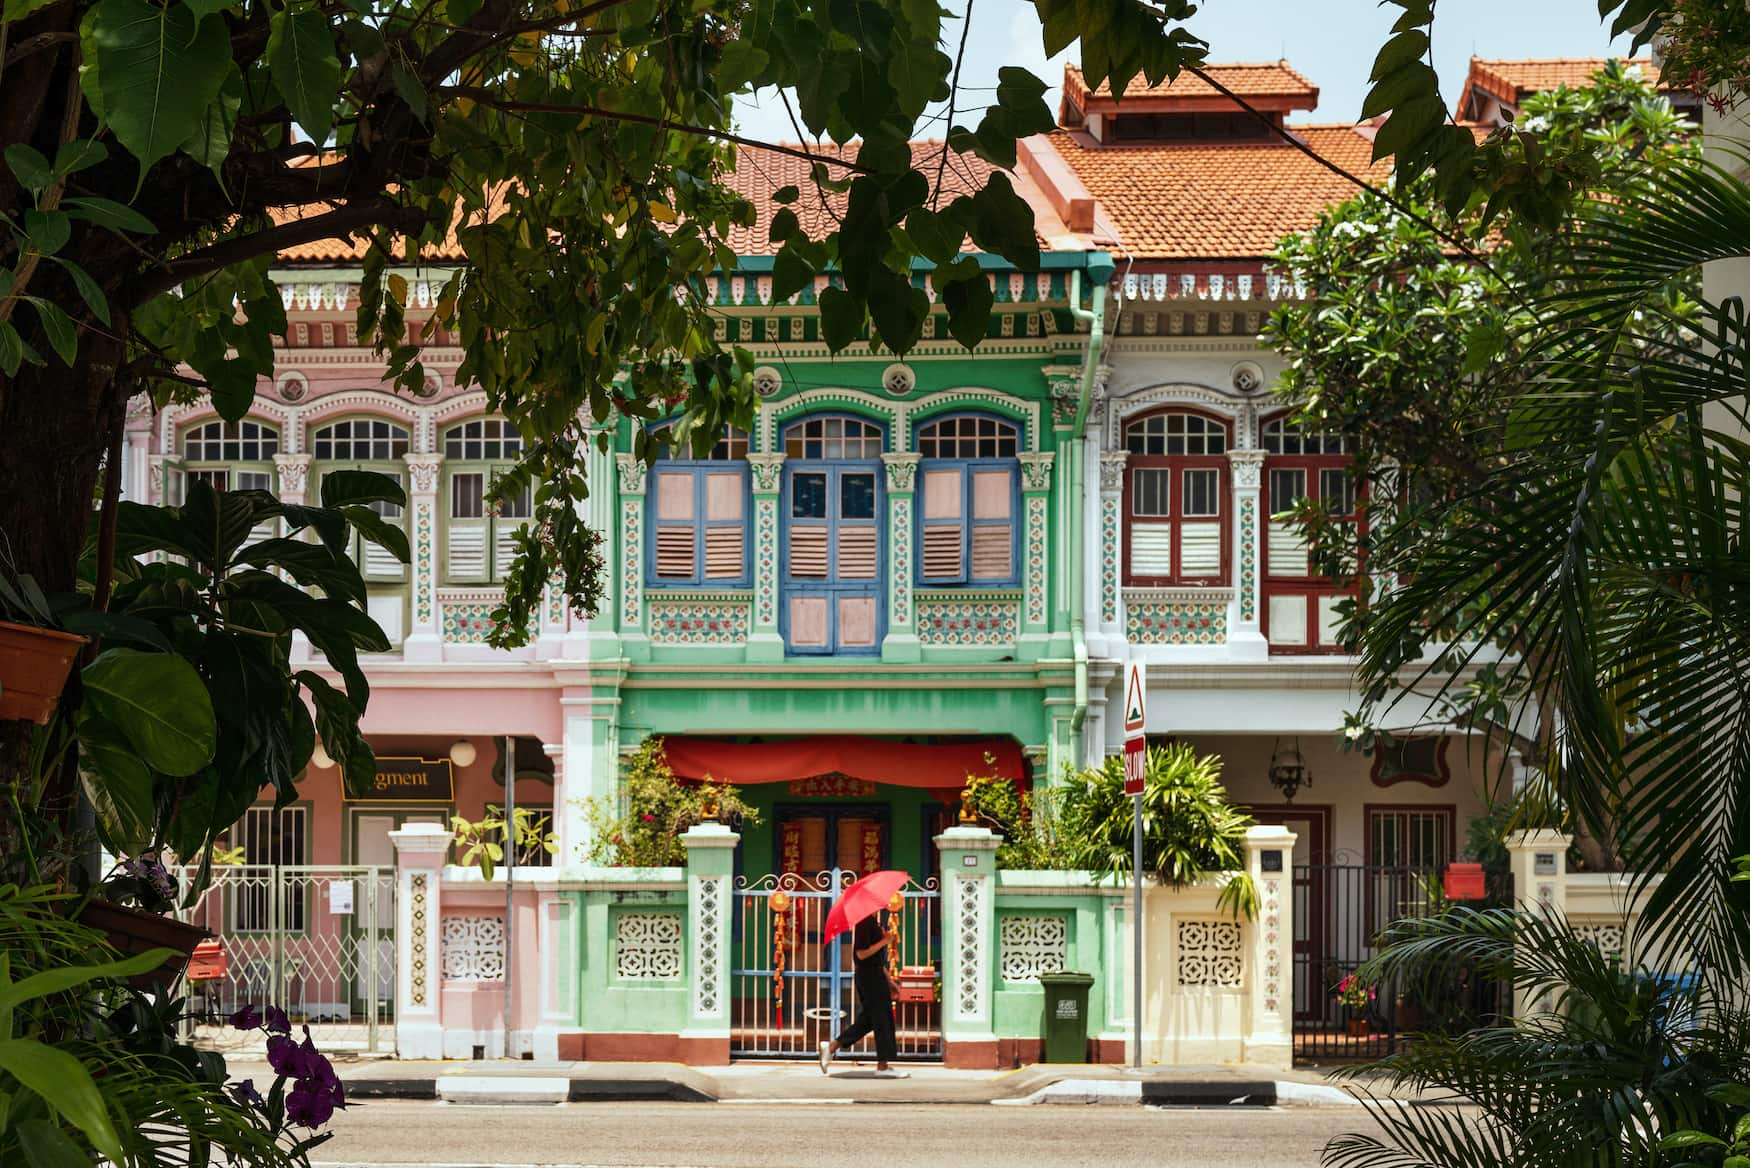 Bunte Kulturen in Singapur